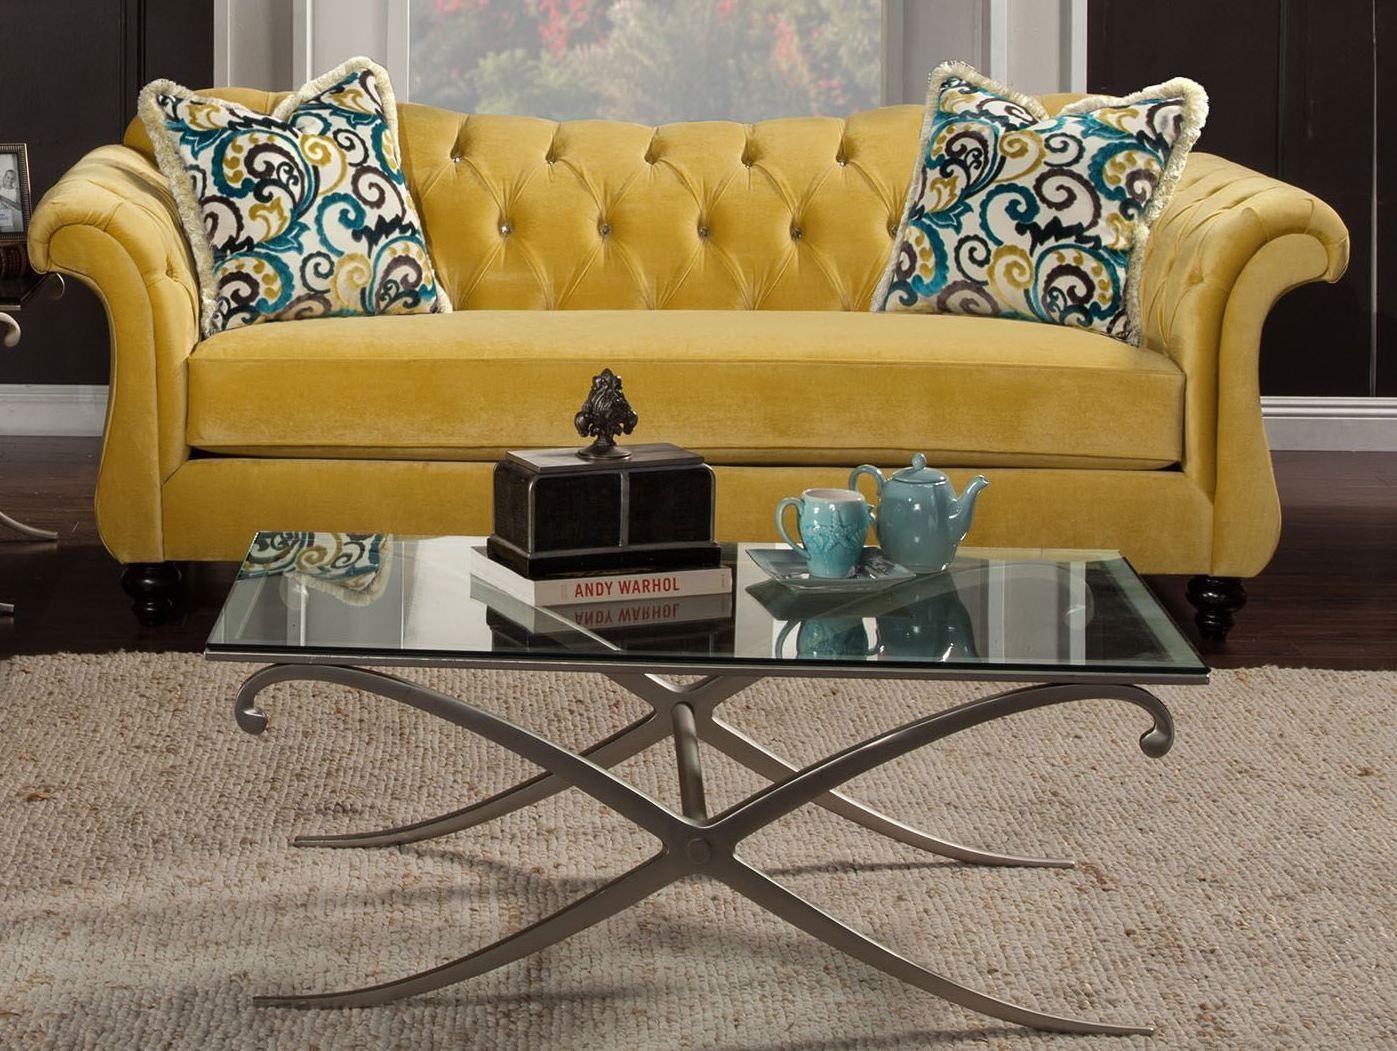 Antoinette Royal Yellow Sofa, SM2223-SF, Furniture Of America